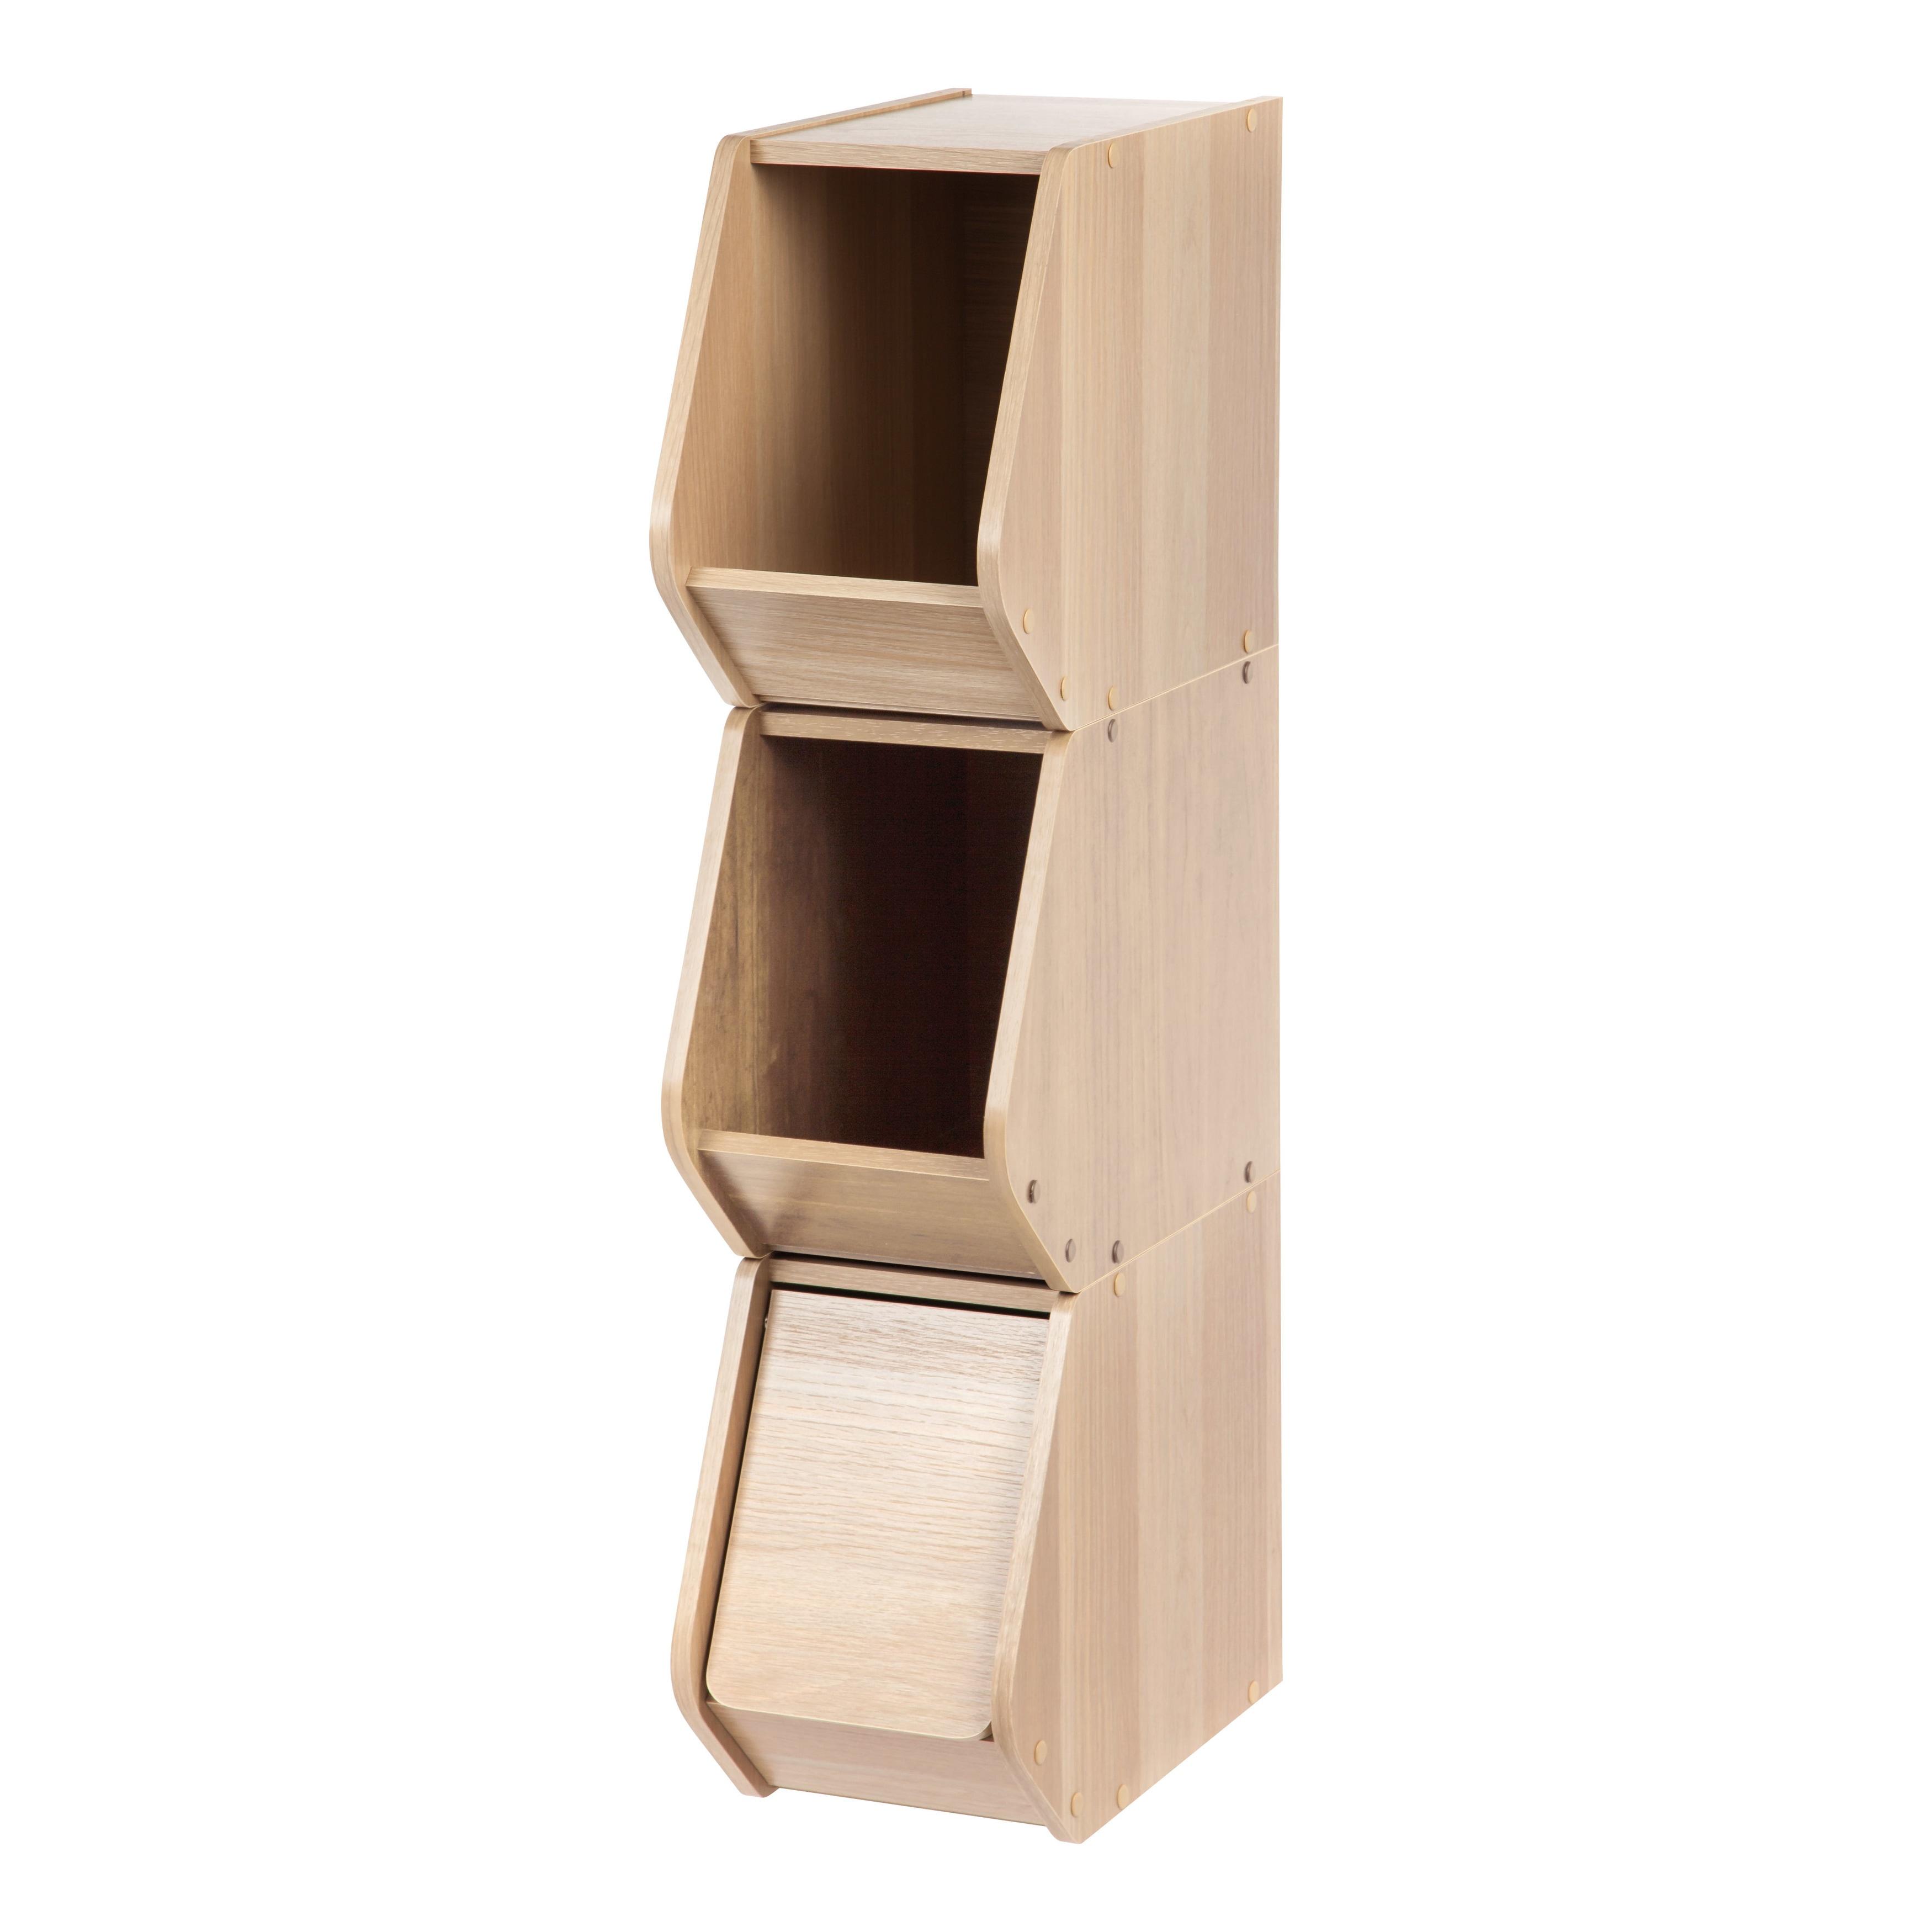 Shop IRIS Modular Wood Stacking Storage Box with Door, Narrow - Free ...